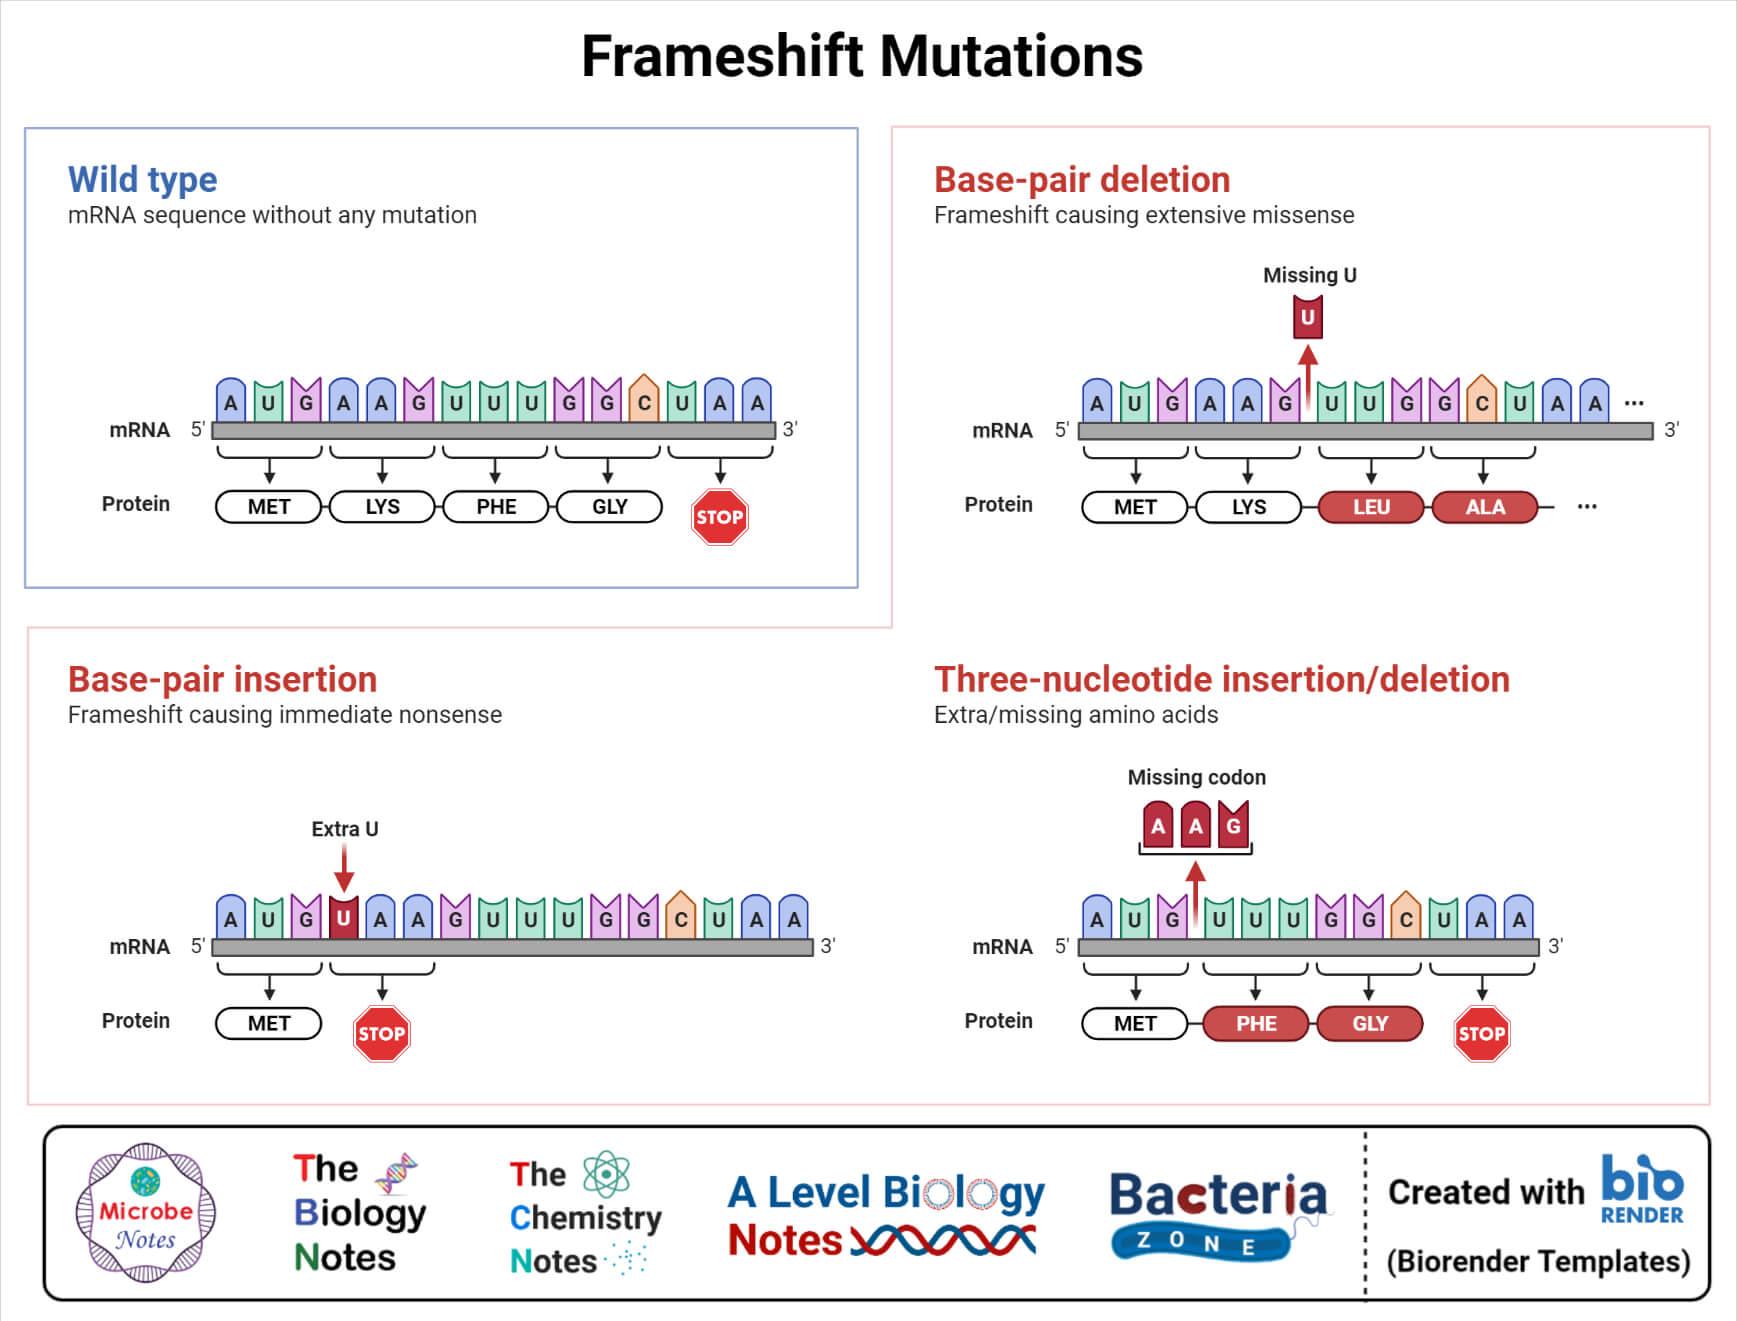 Frameshift mutation